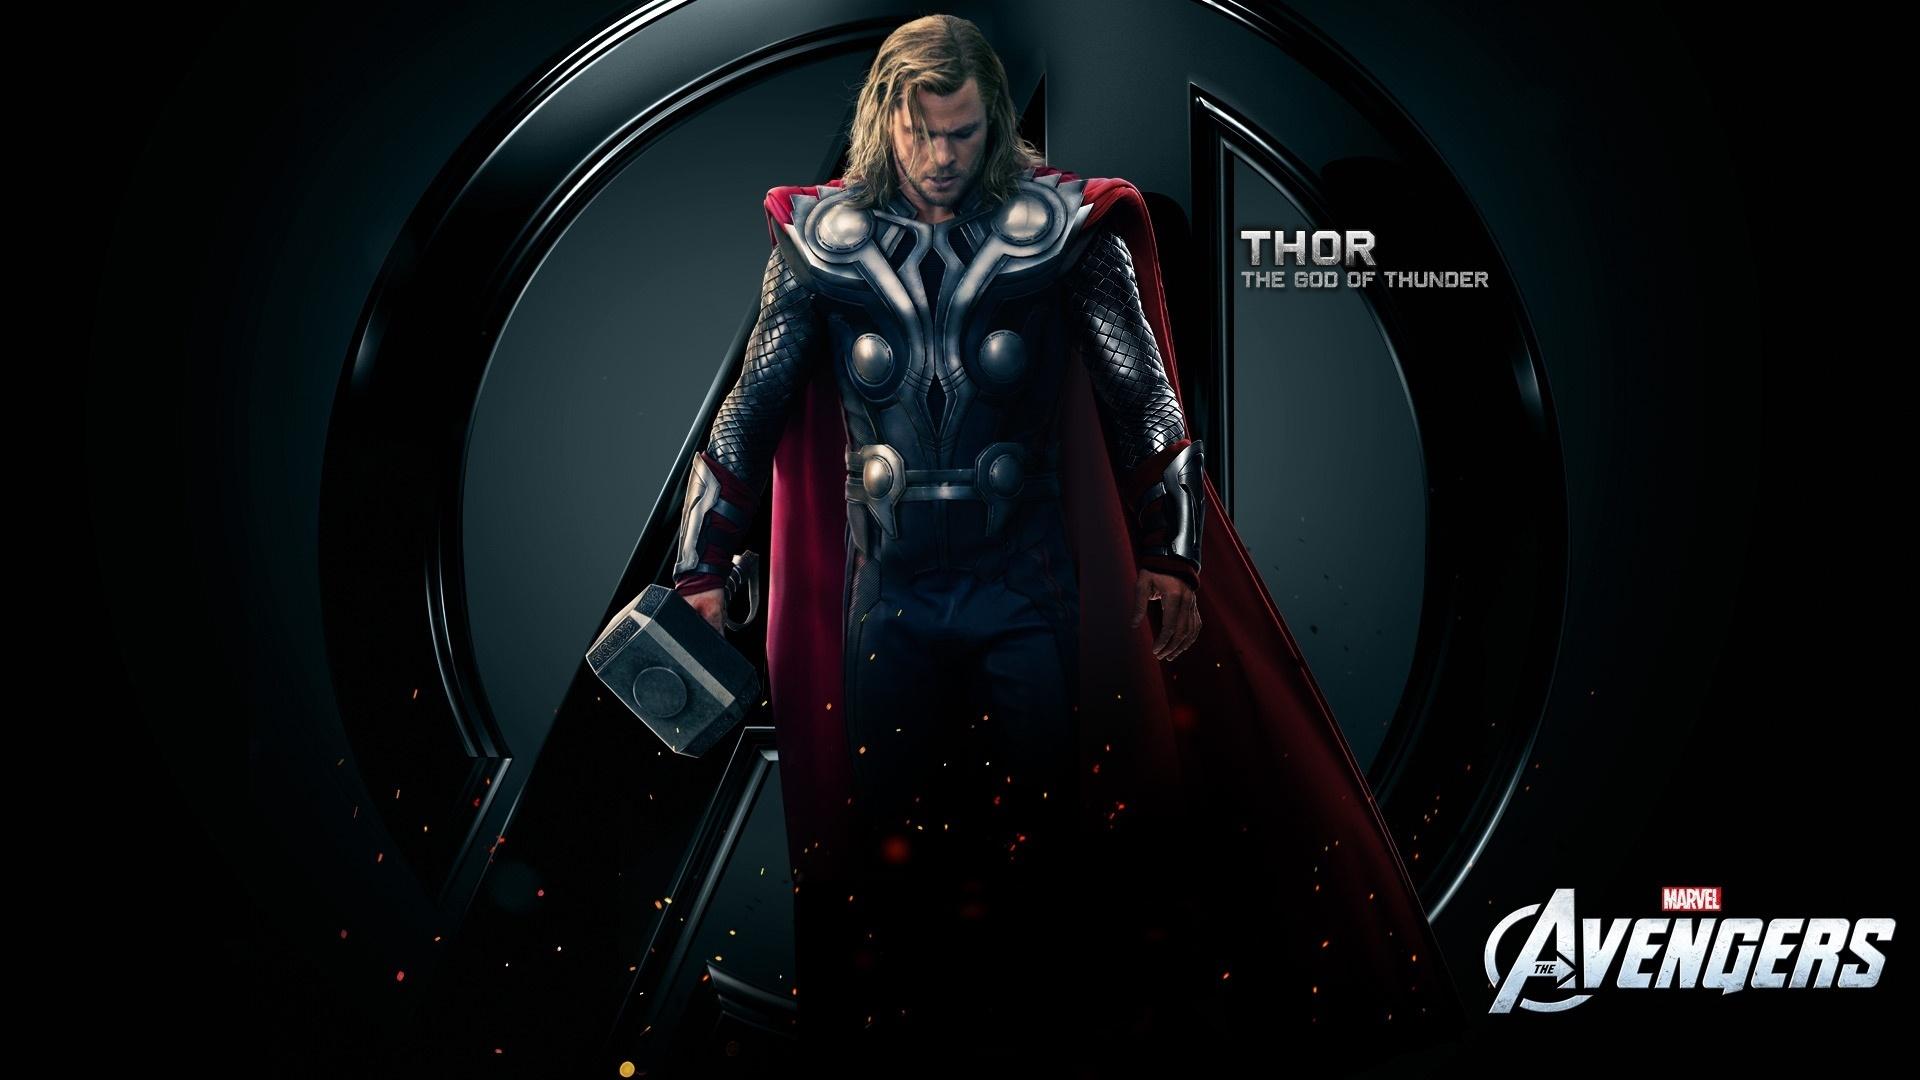 Afbeelding The Avengers (2012) Chris Hemsworth Thor superheld Films film